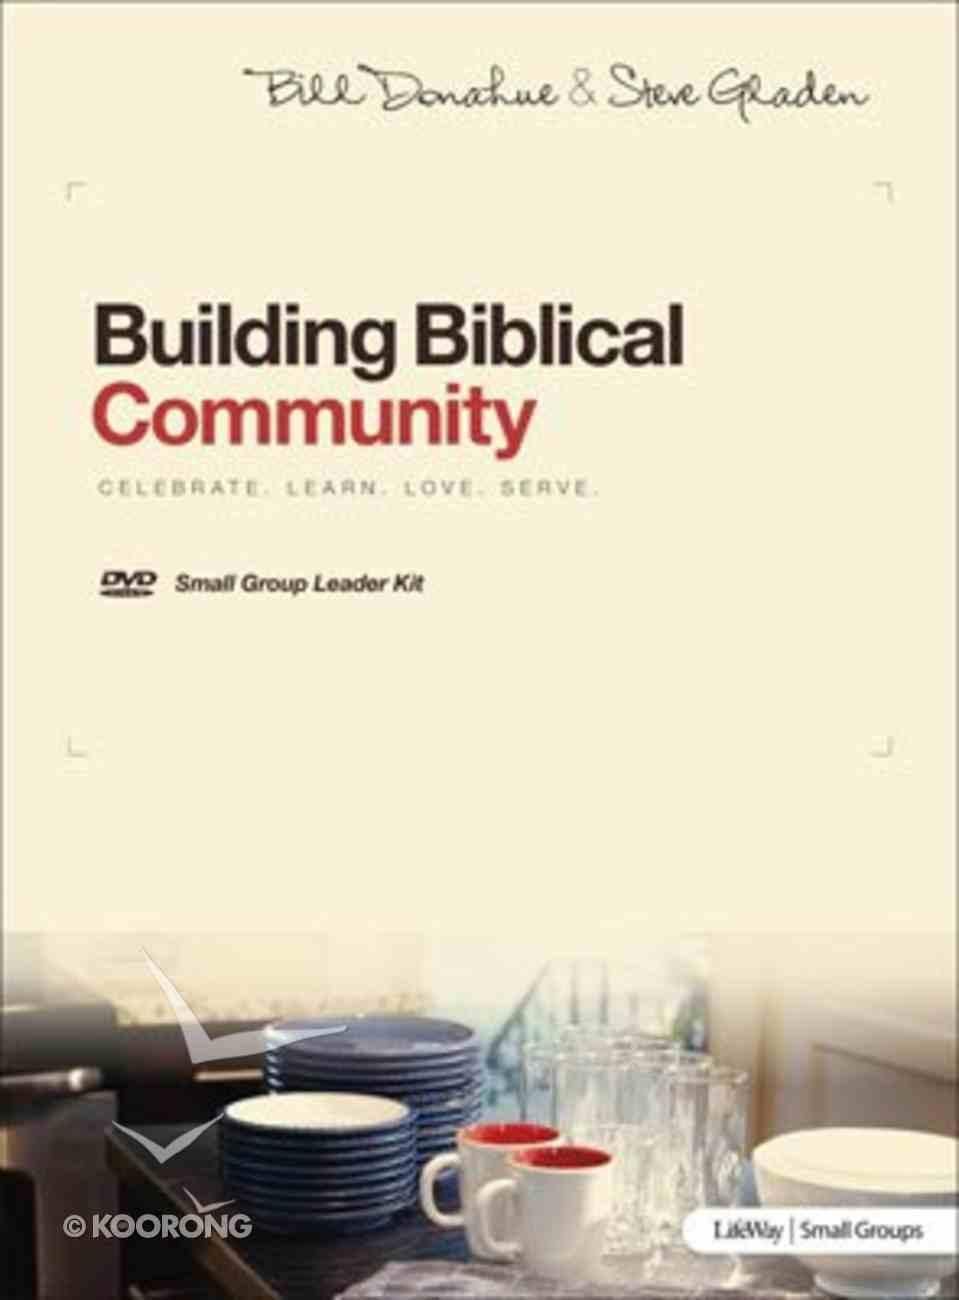 Building Biblical Community (Dvd Leader Kit) DVD